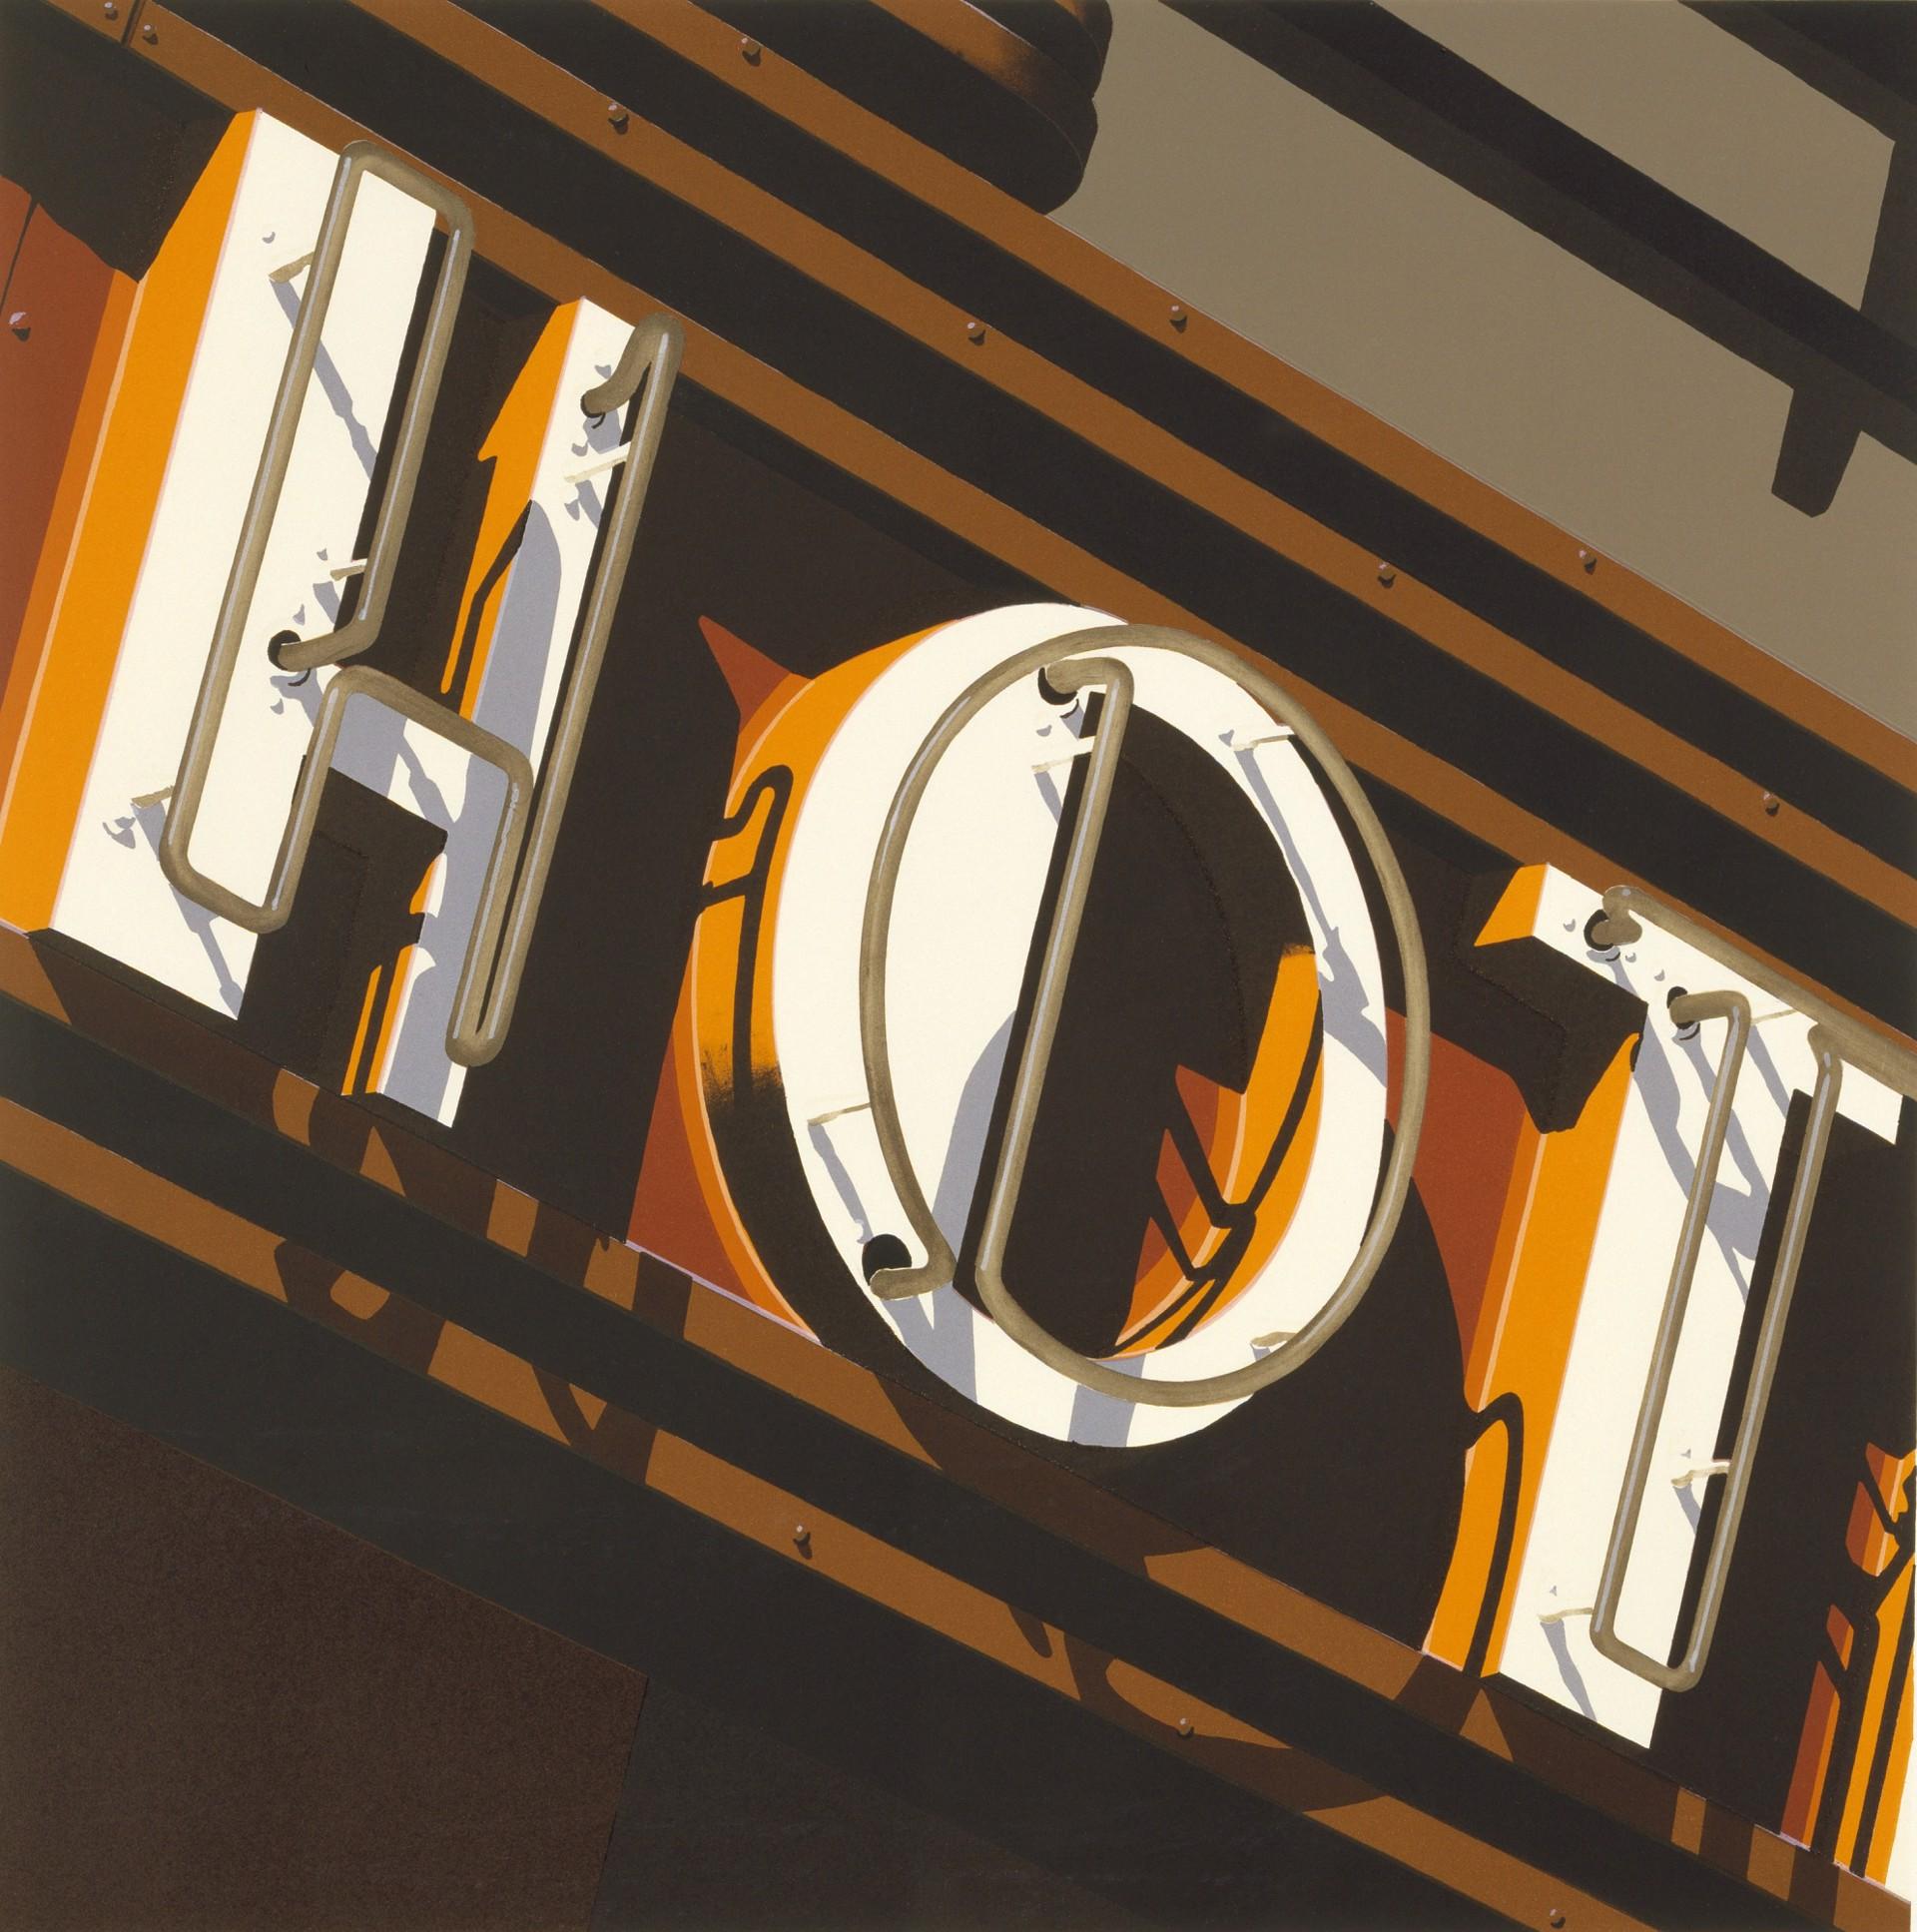 HOT by Robert Cottingham